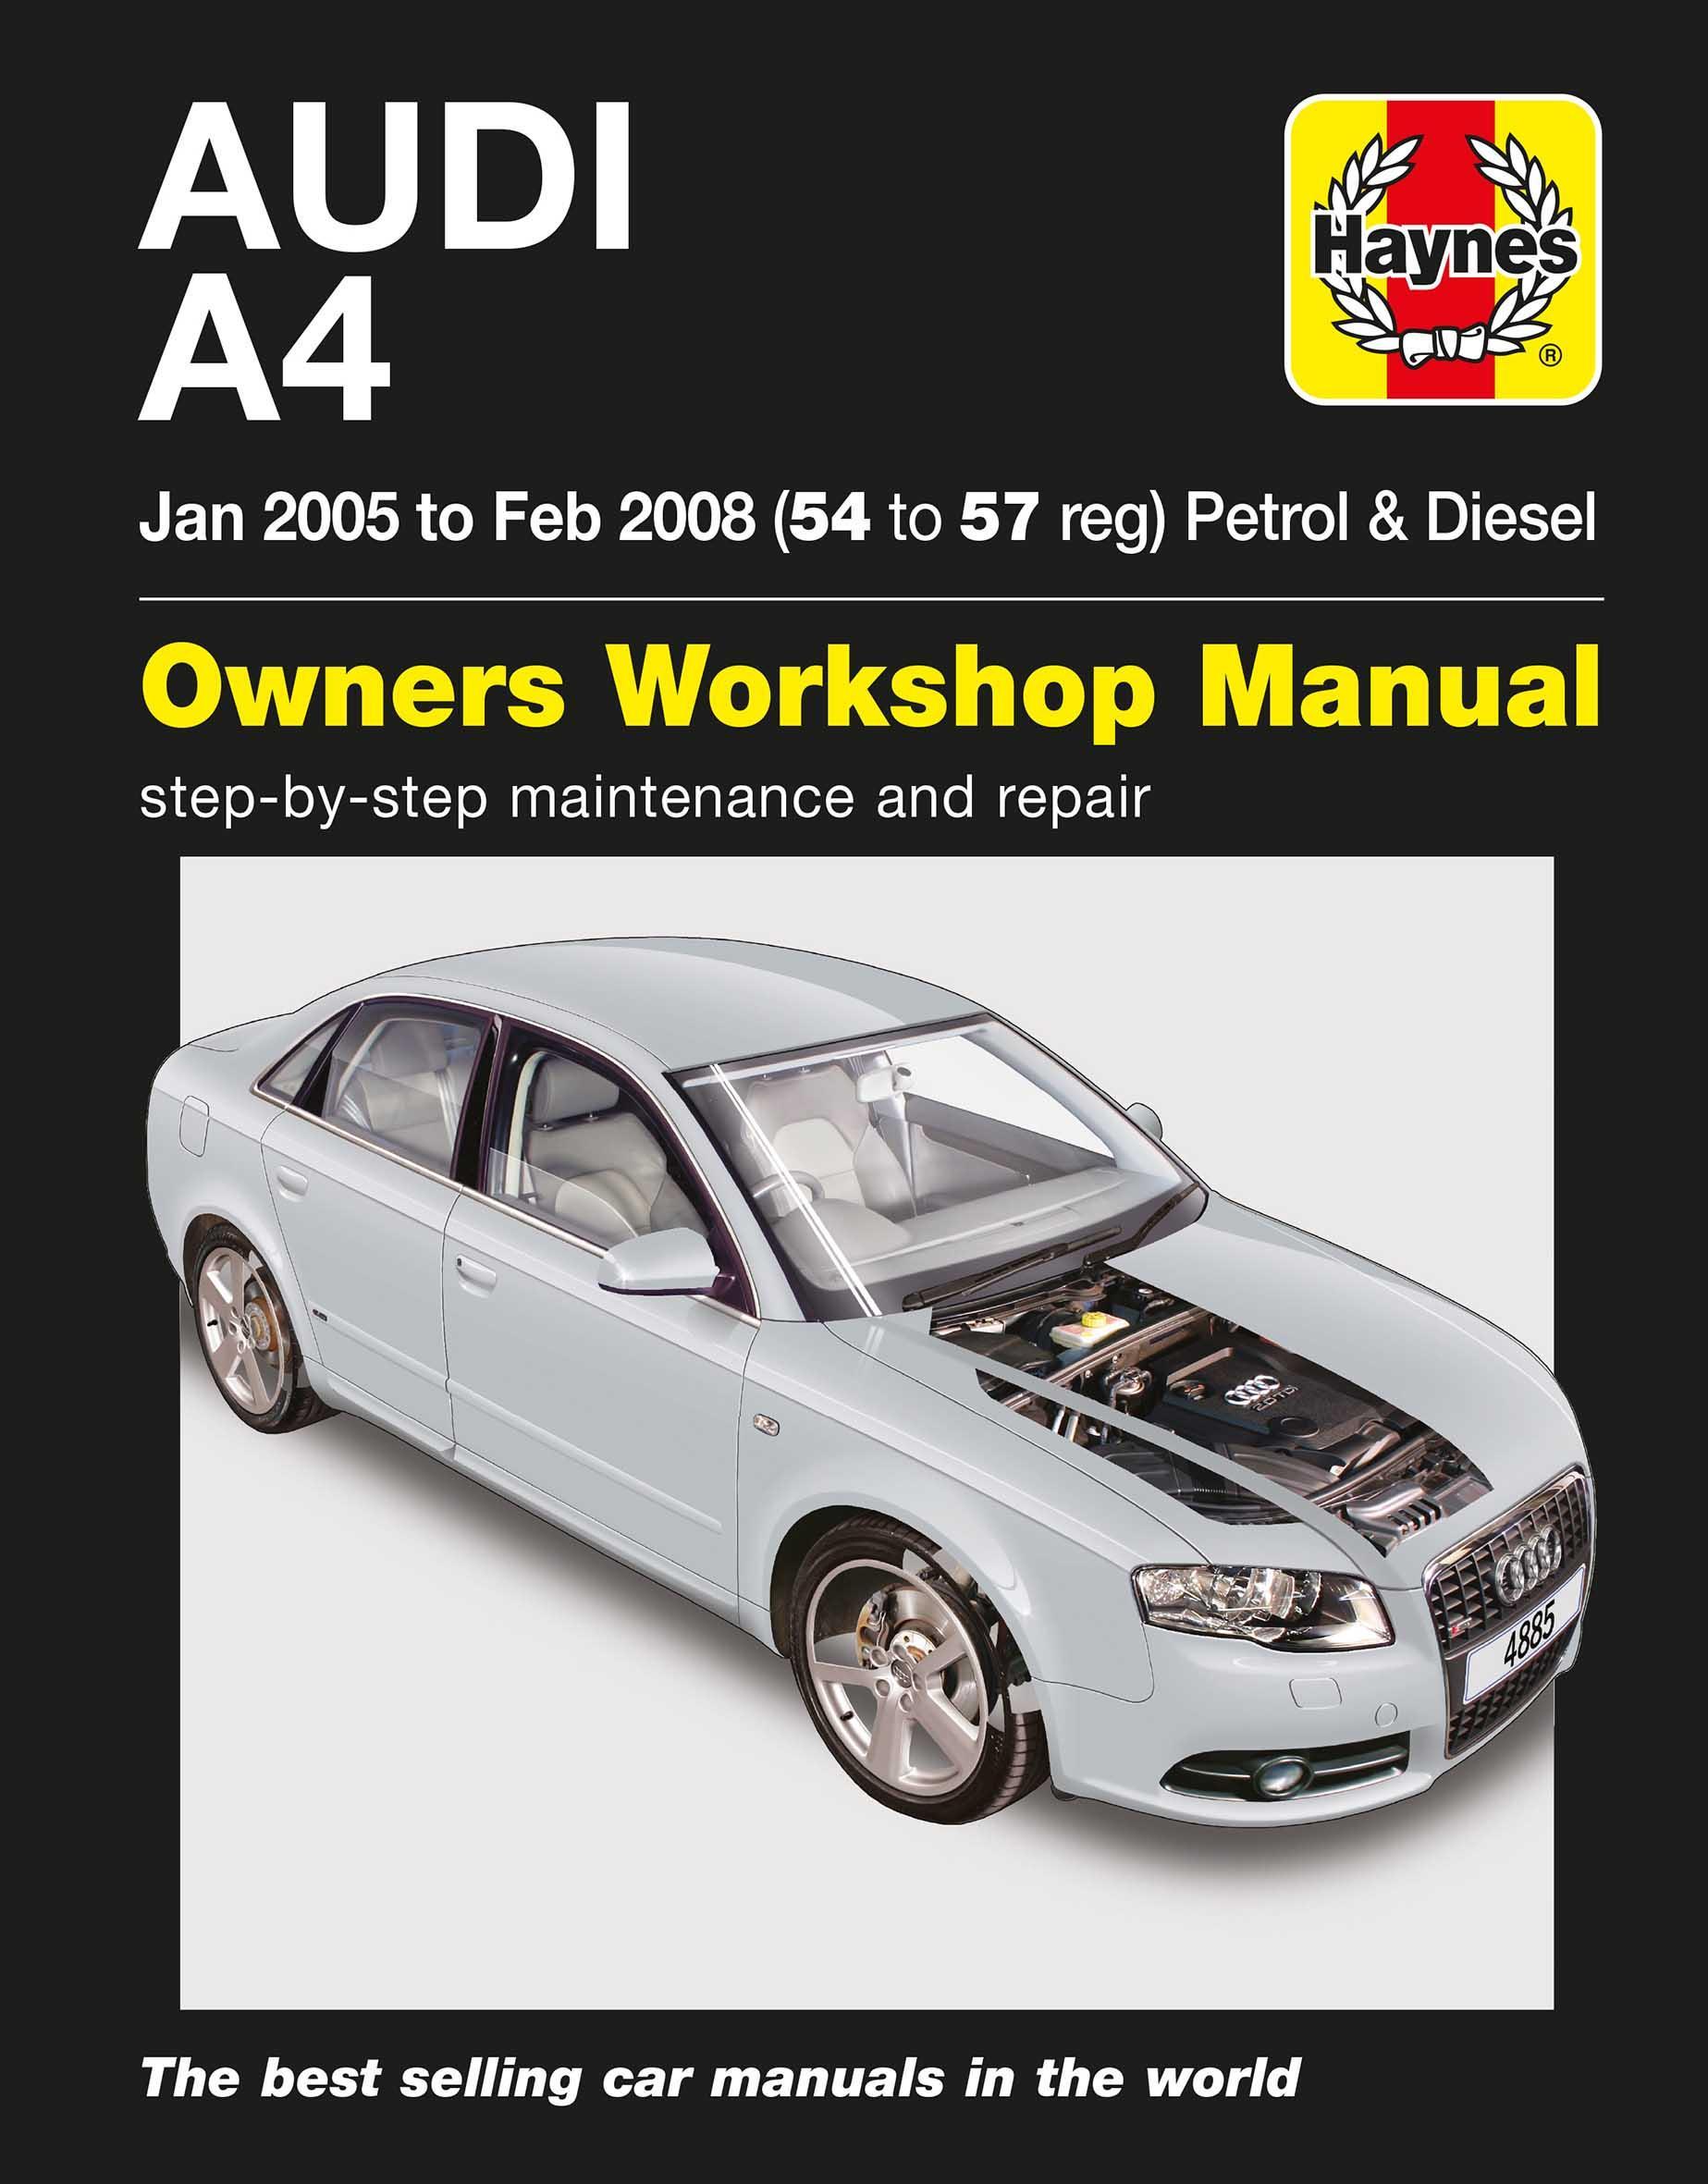 haynes manual audi a4 b8 open source user manual u2022 rh dramatic varieties com Audi A4 B7 B1 Audi A4